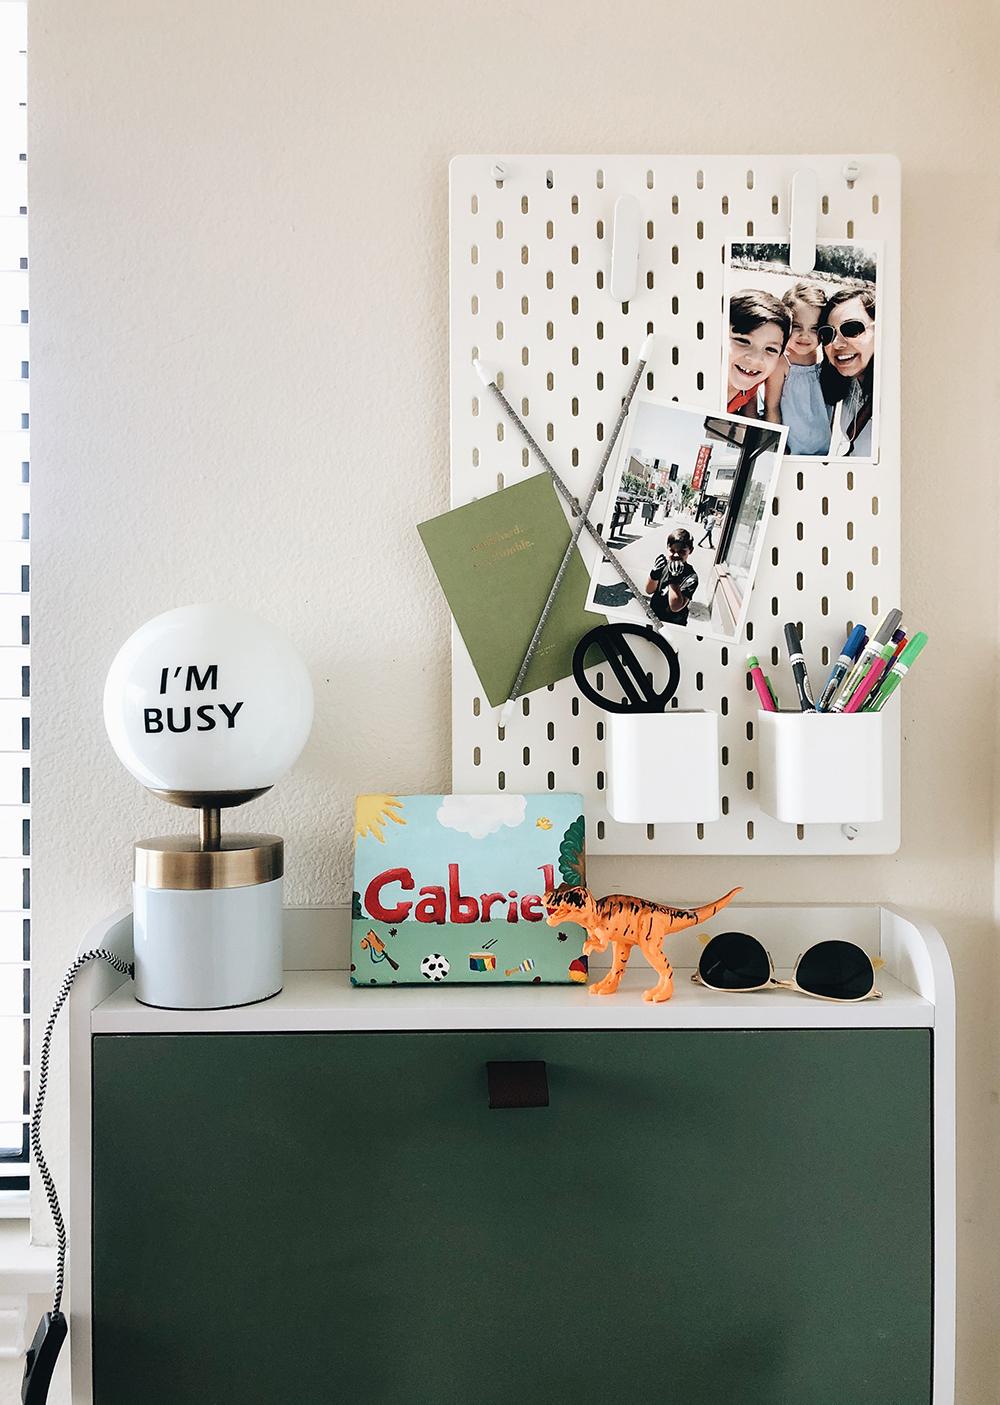 Ikea Skadis pegboard and organizers // Wall mounted desk // Space saving kids workspace!